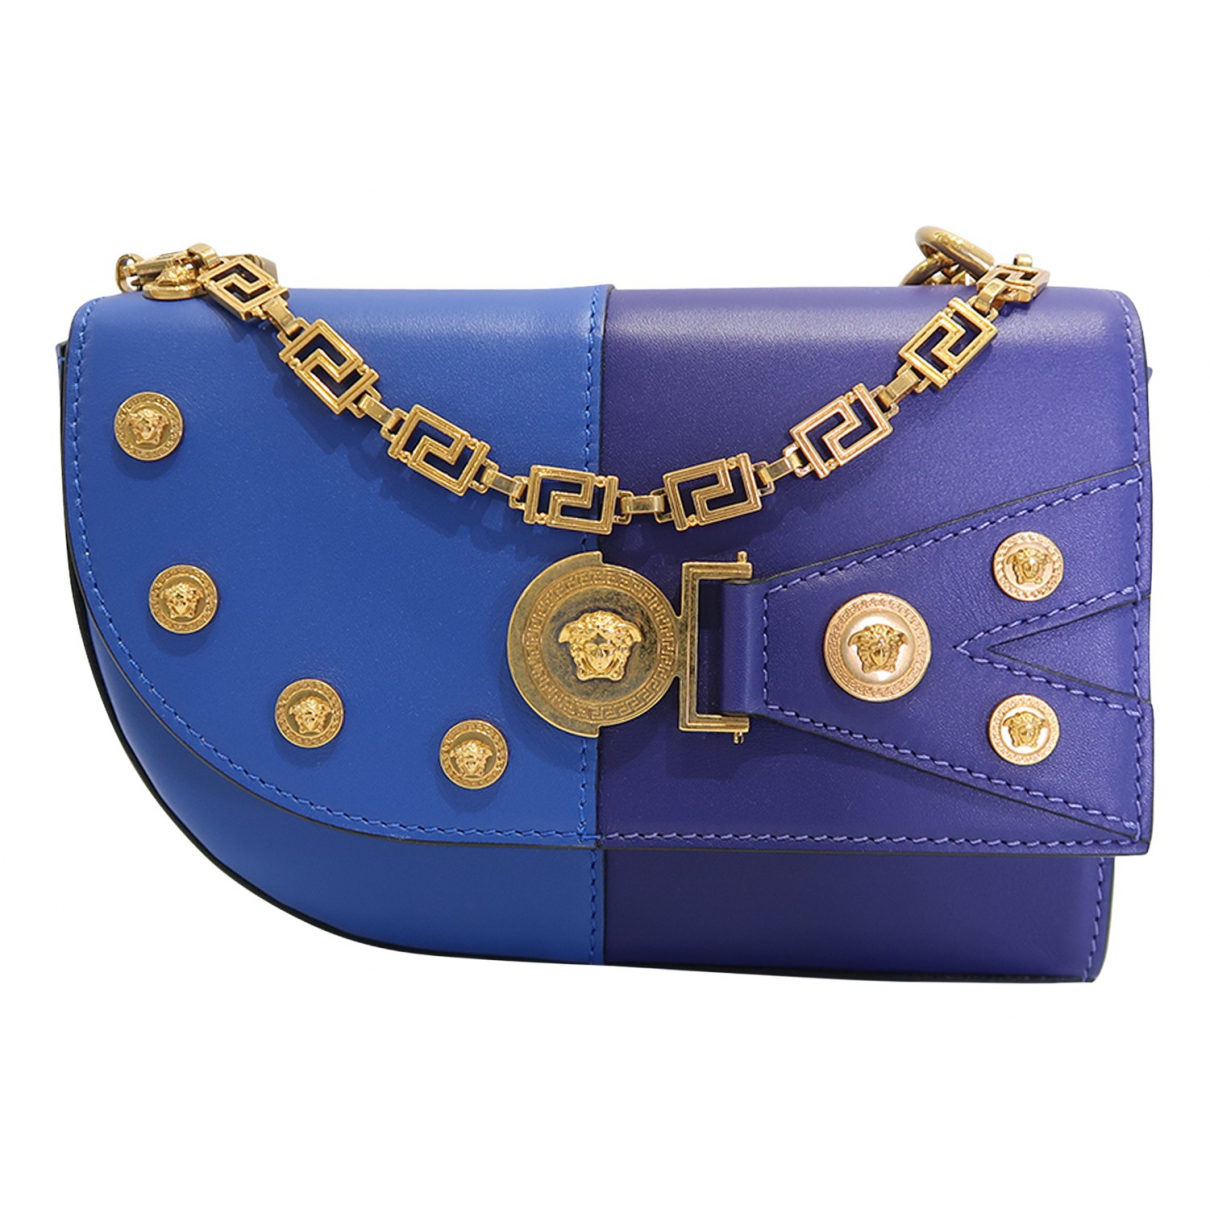 Versace N Blue Leather handbag for Women N